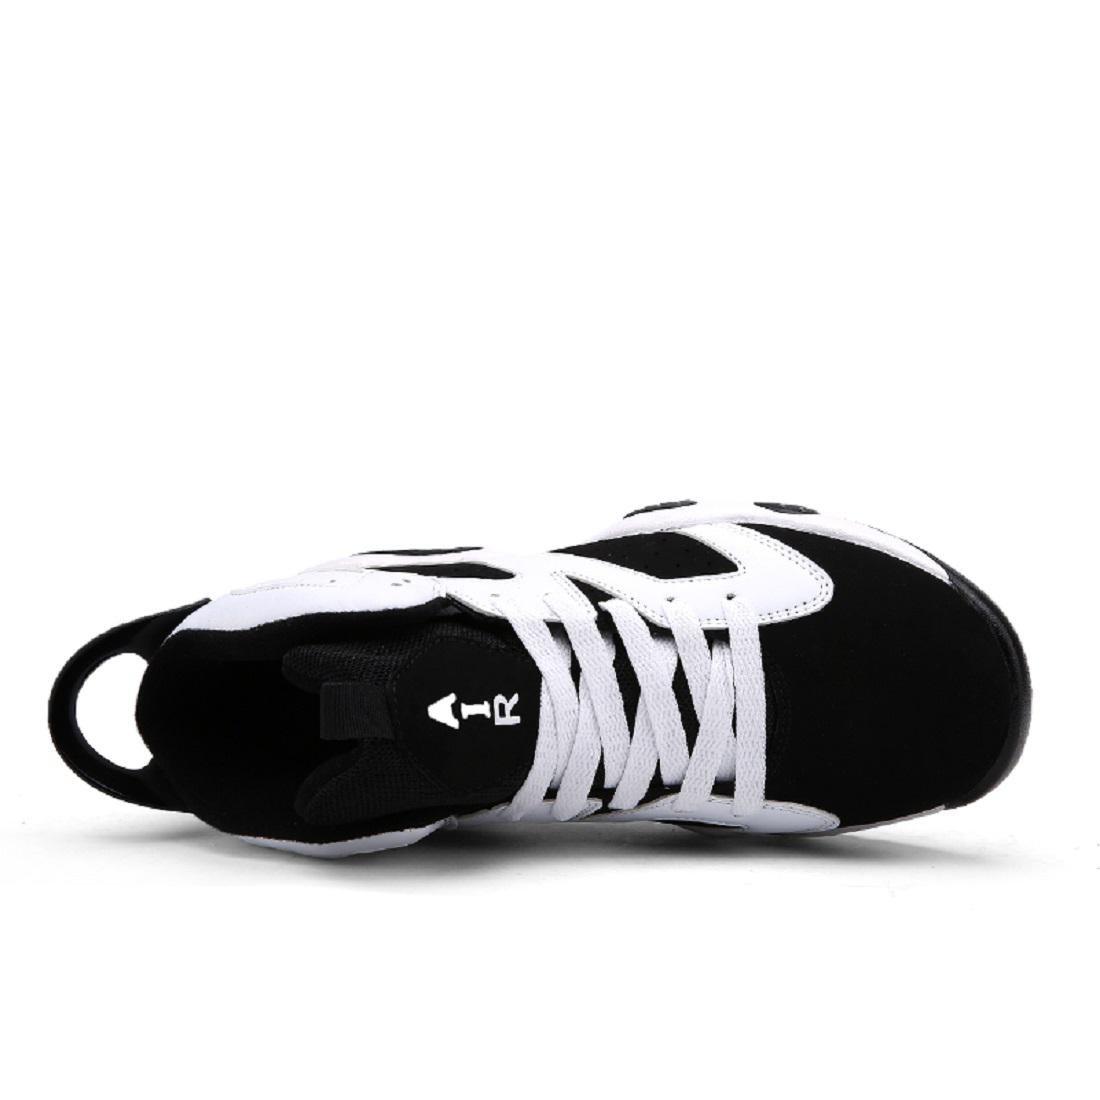 Hombres Zapatos deportivos deportivos deportivos Formación Respirable Aumentado Zapatos de basquetbol Zapatillas Entrenadores , Blanco , 36 f77f62